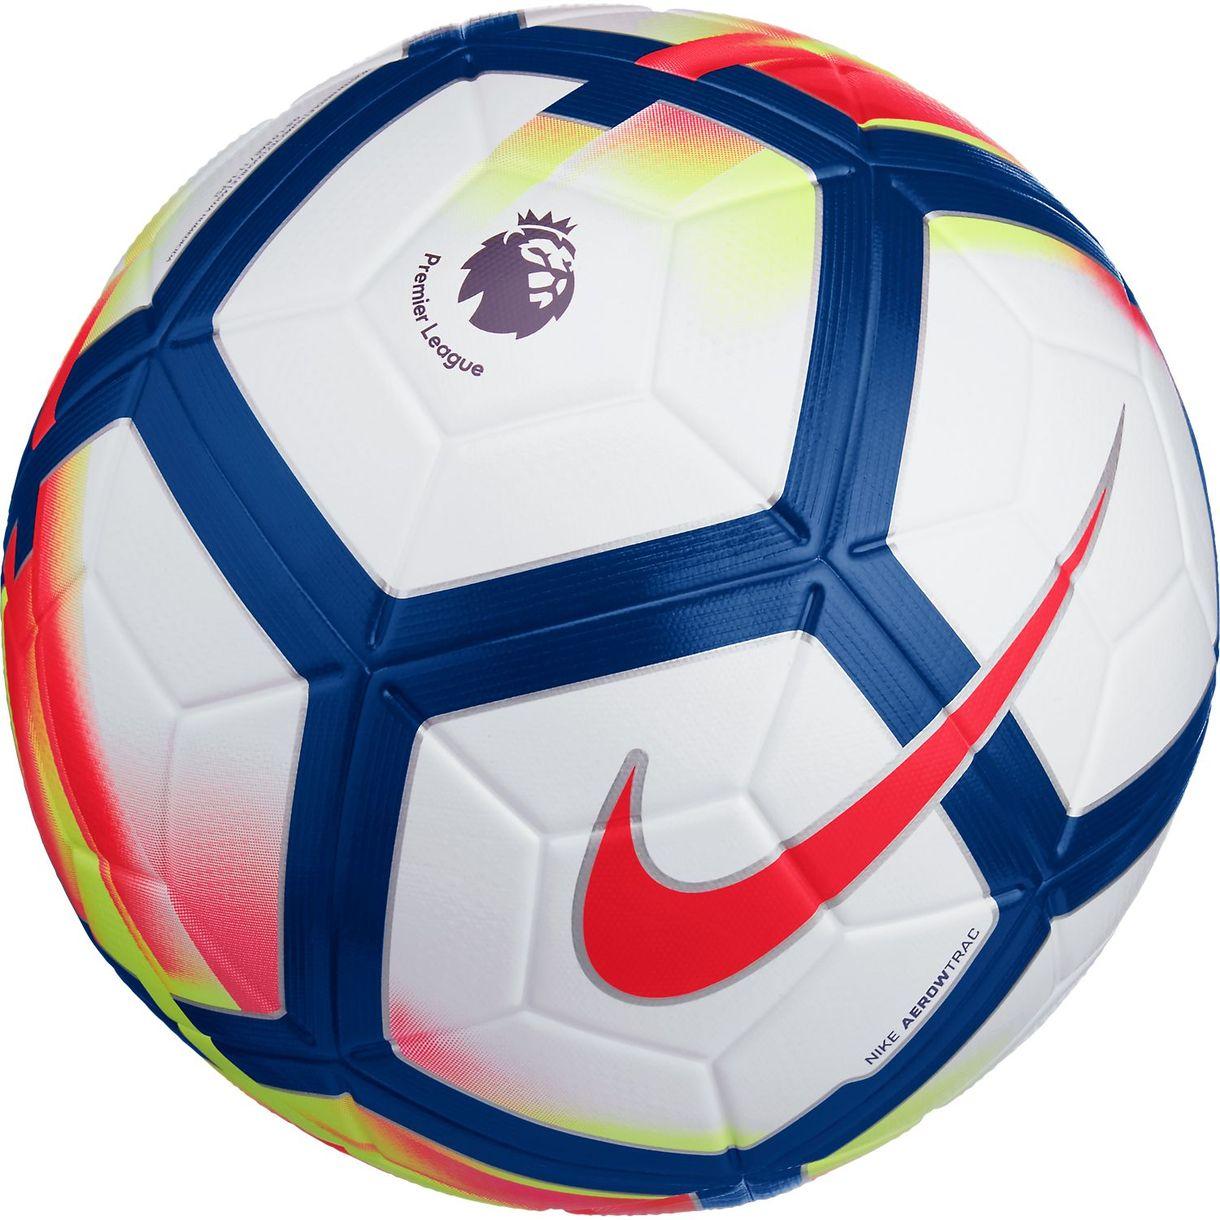 e16e9c7d6 Piłka NIKE Premier League ORDEM 5 17/18 meczowa 5 - 6880223549 ...